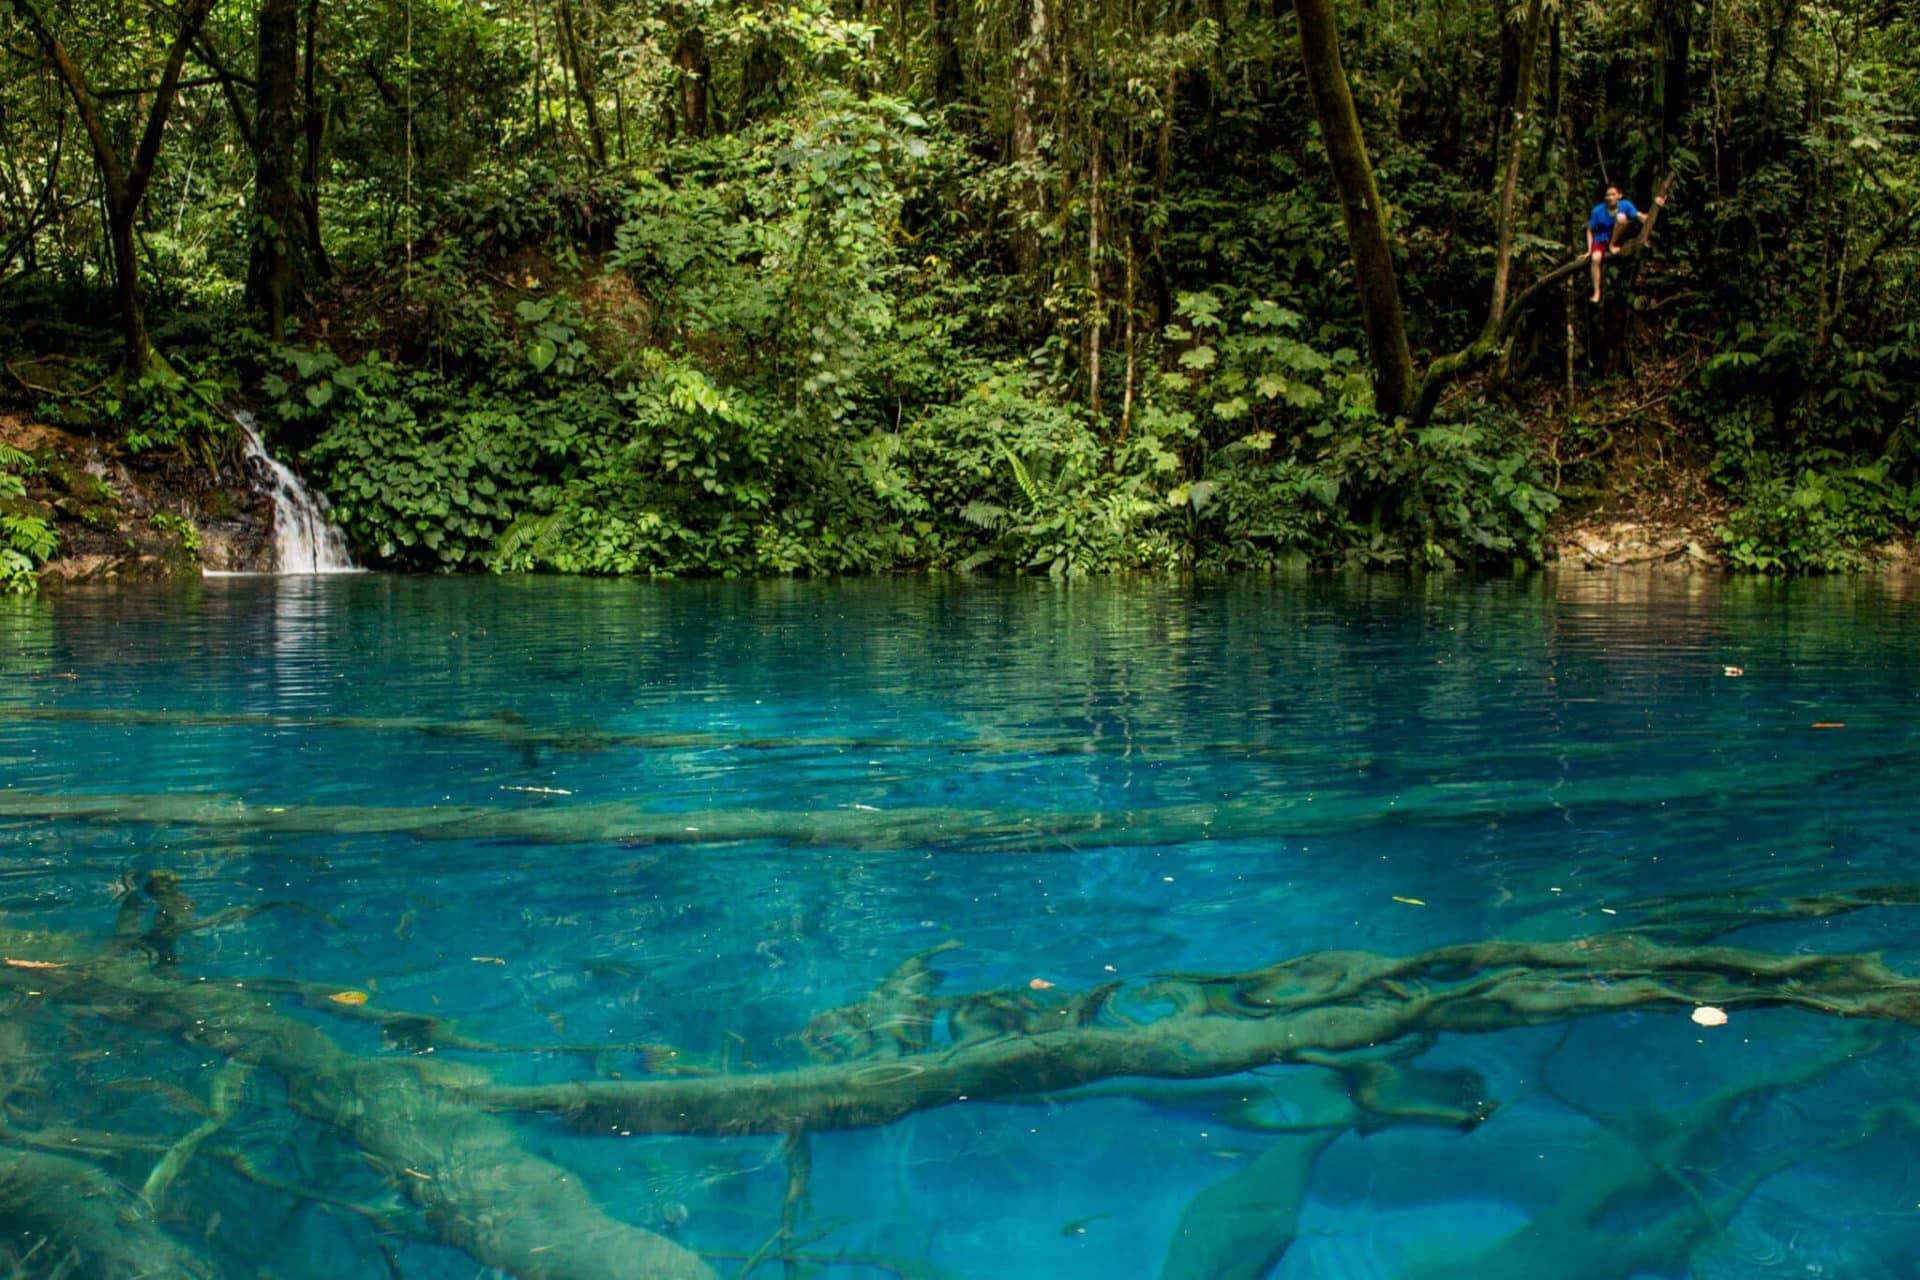 A forest stream flows into the brilliantly blue Lake Kaco in the middle of the rainforest, Danau Kaco, Kerinci Seblat National Park, Sumatra, Indonesia